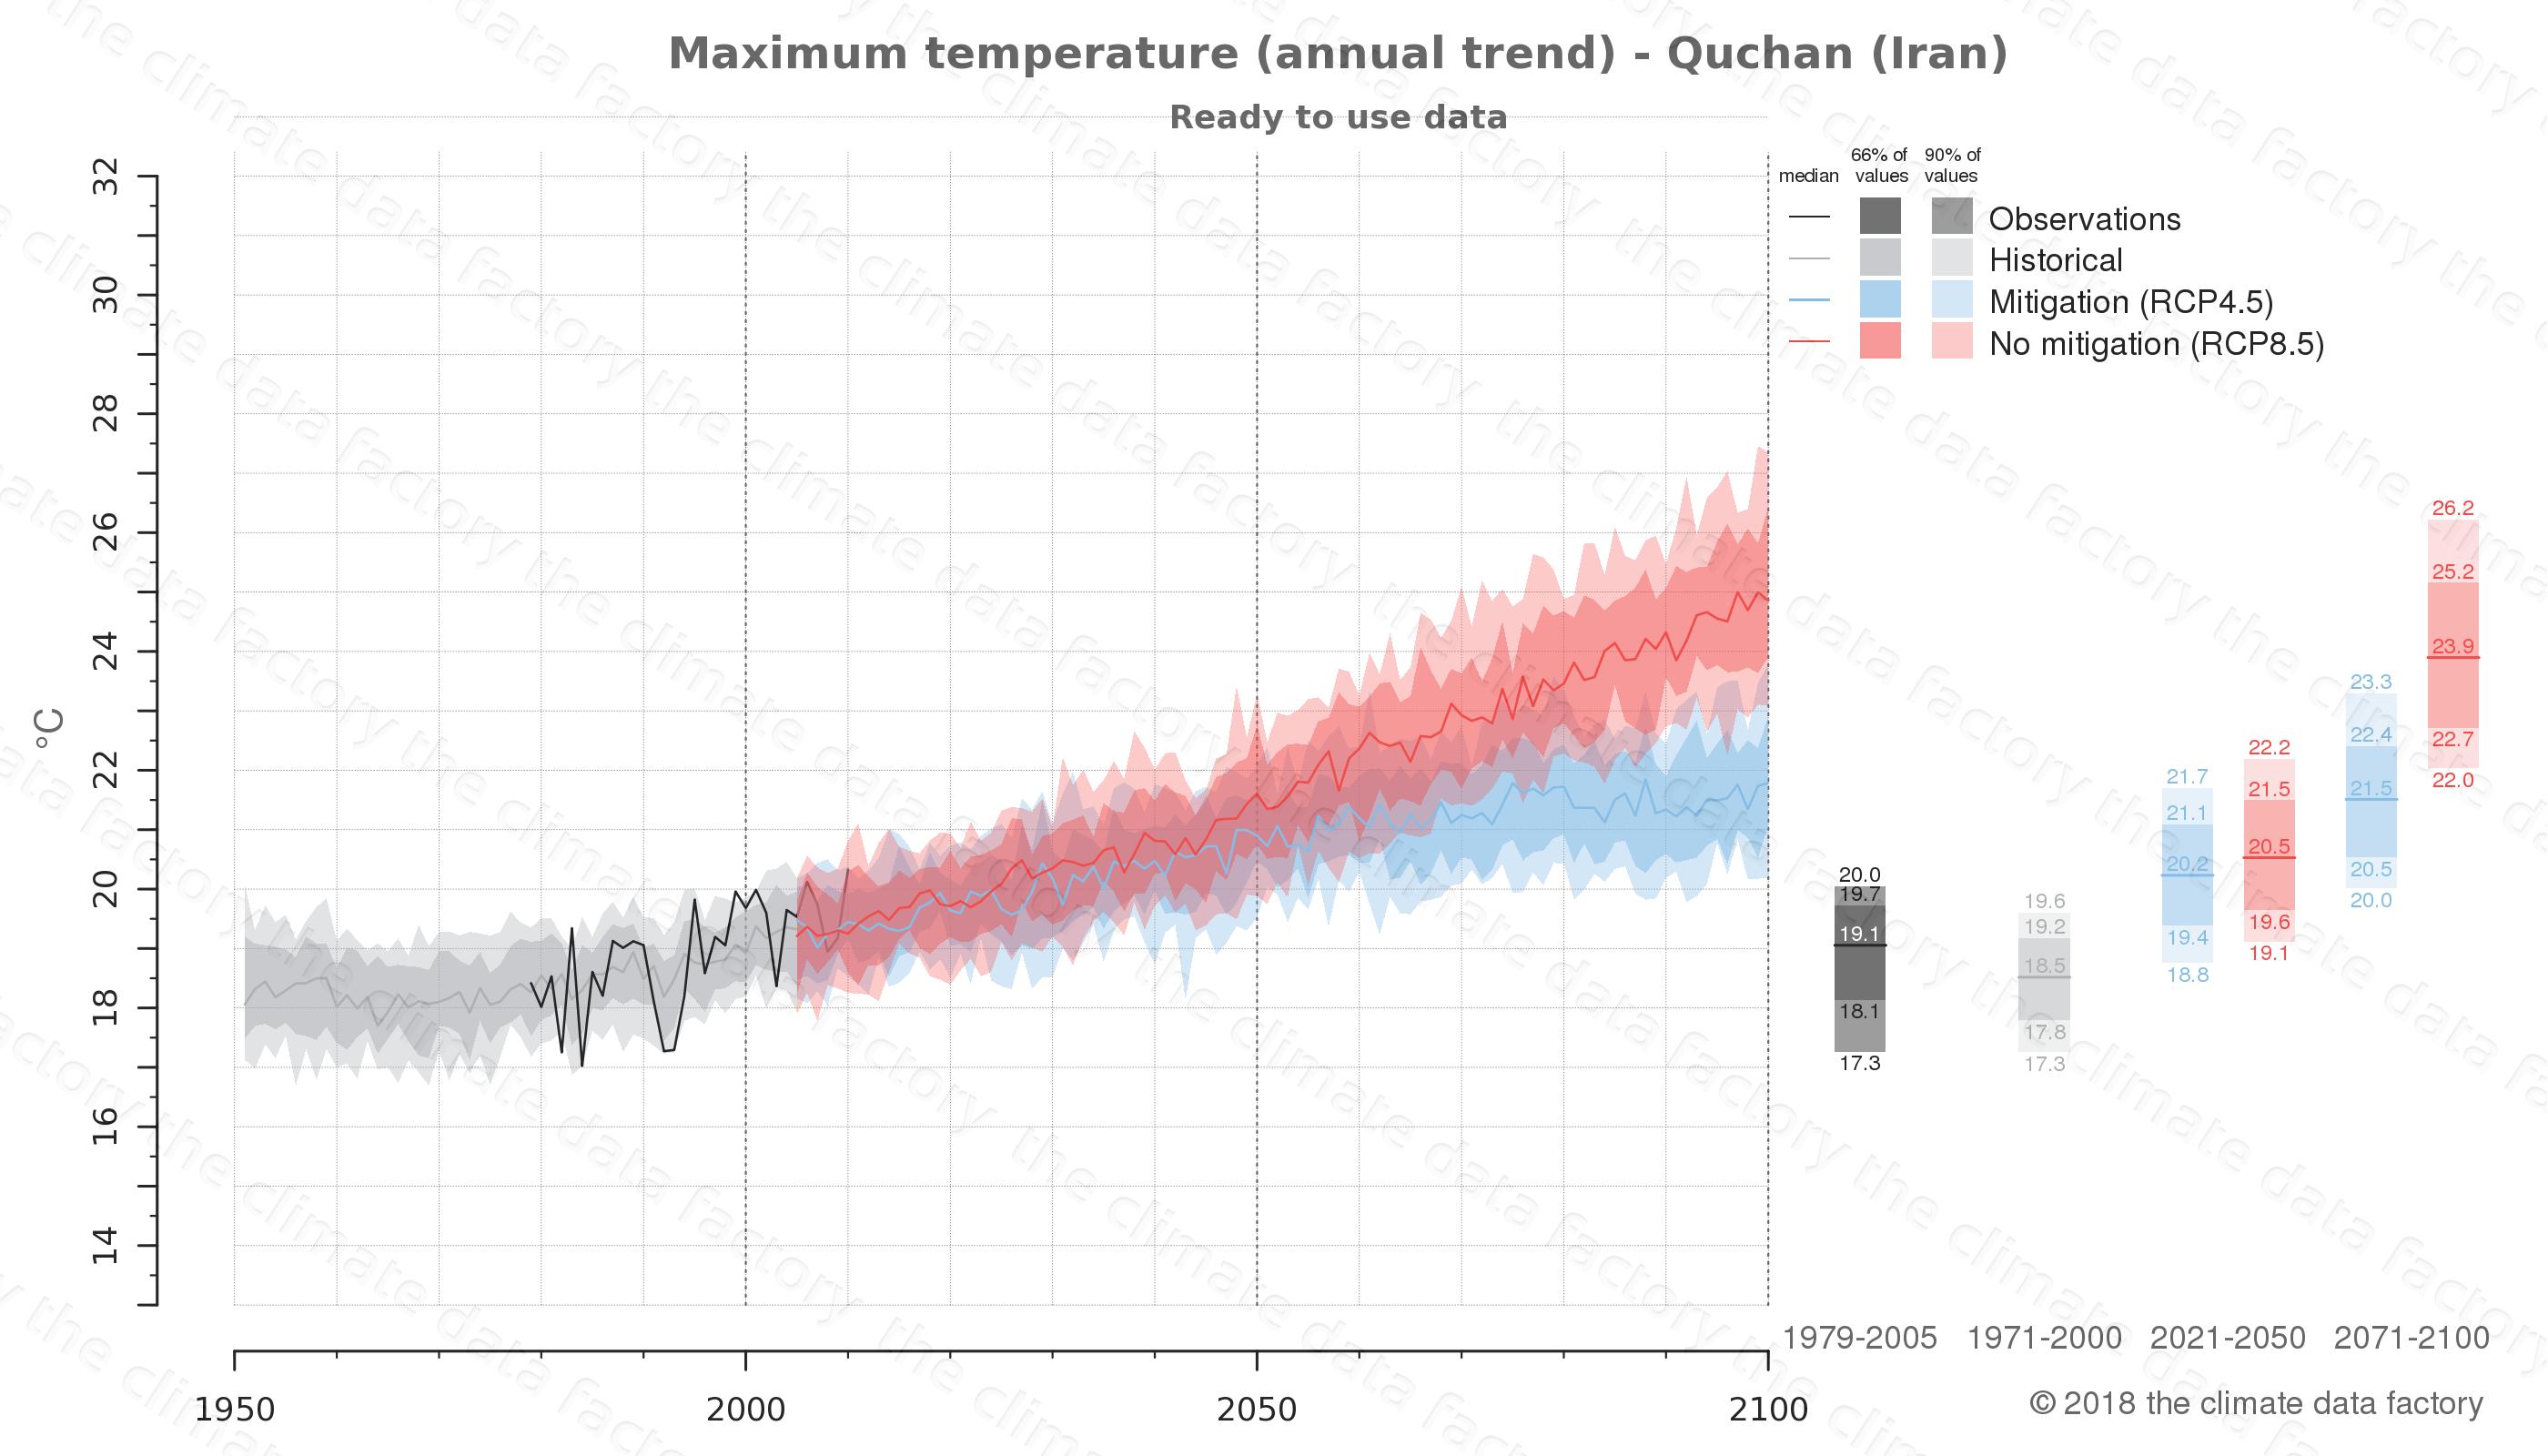 climate change data policy adaptation climate graph city data maximum-temperature quchan iran